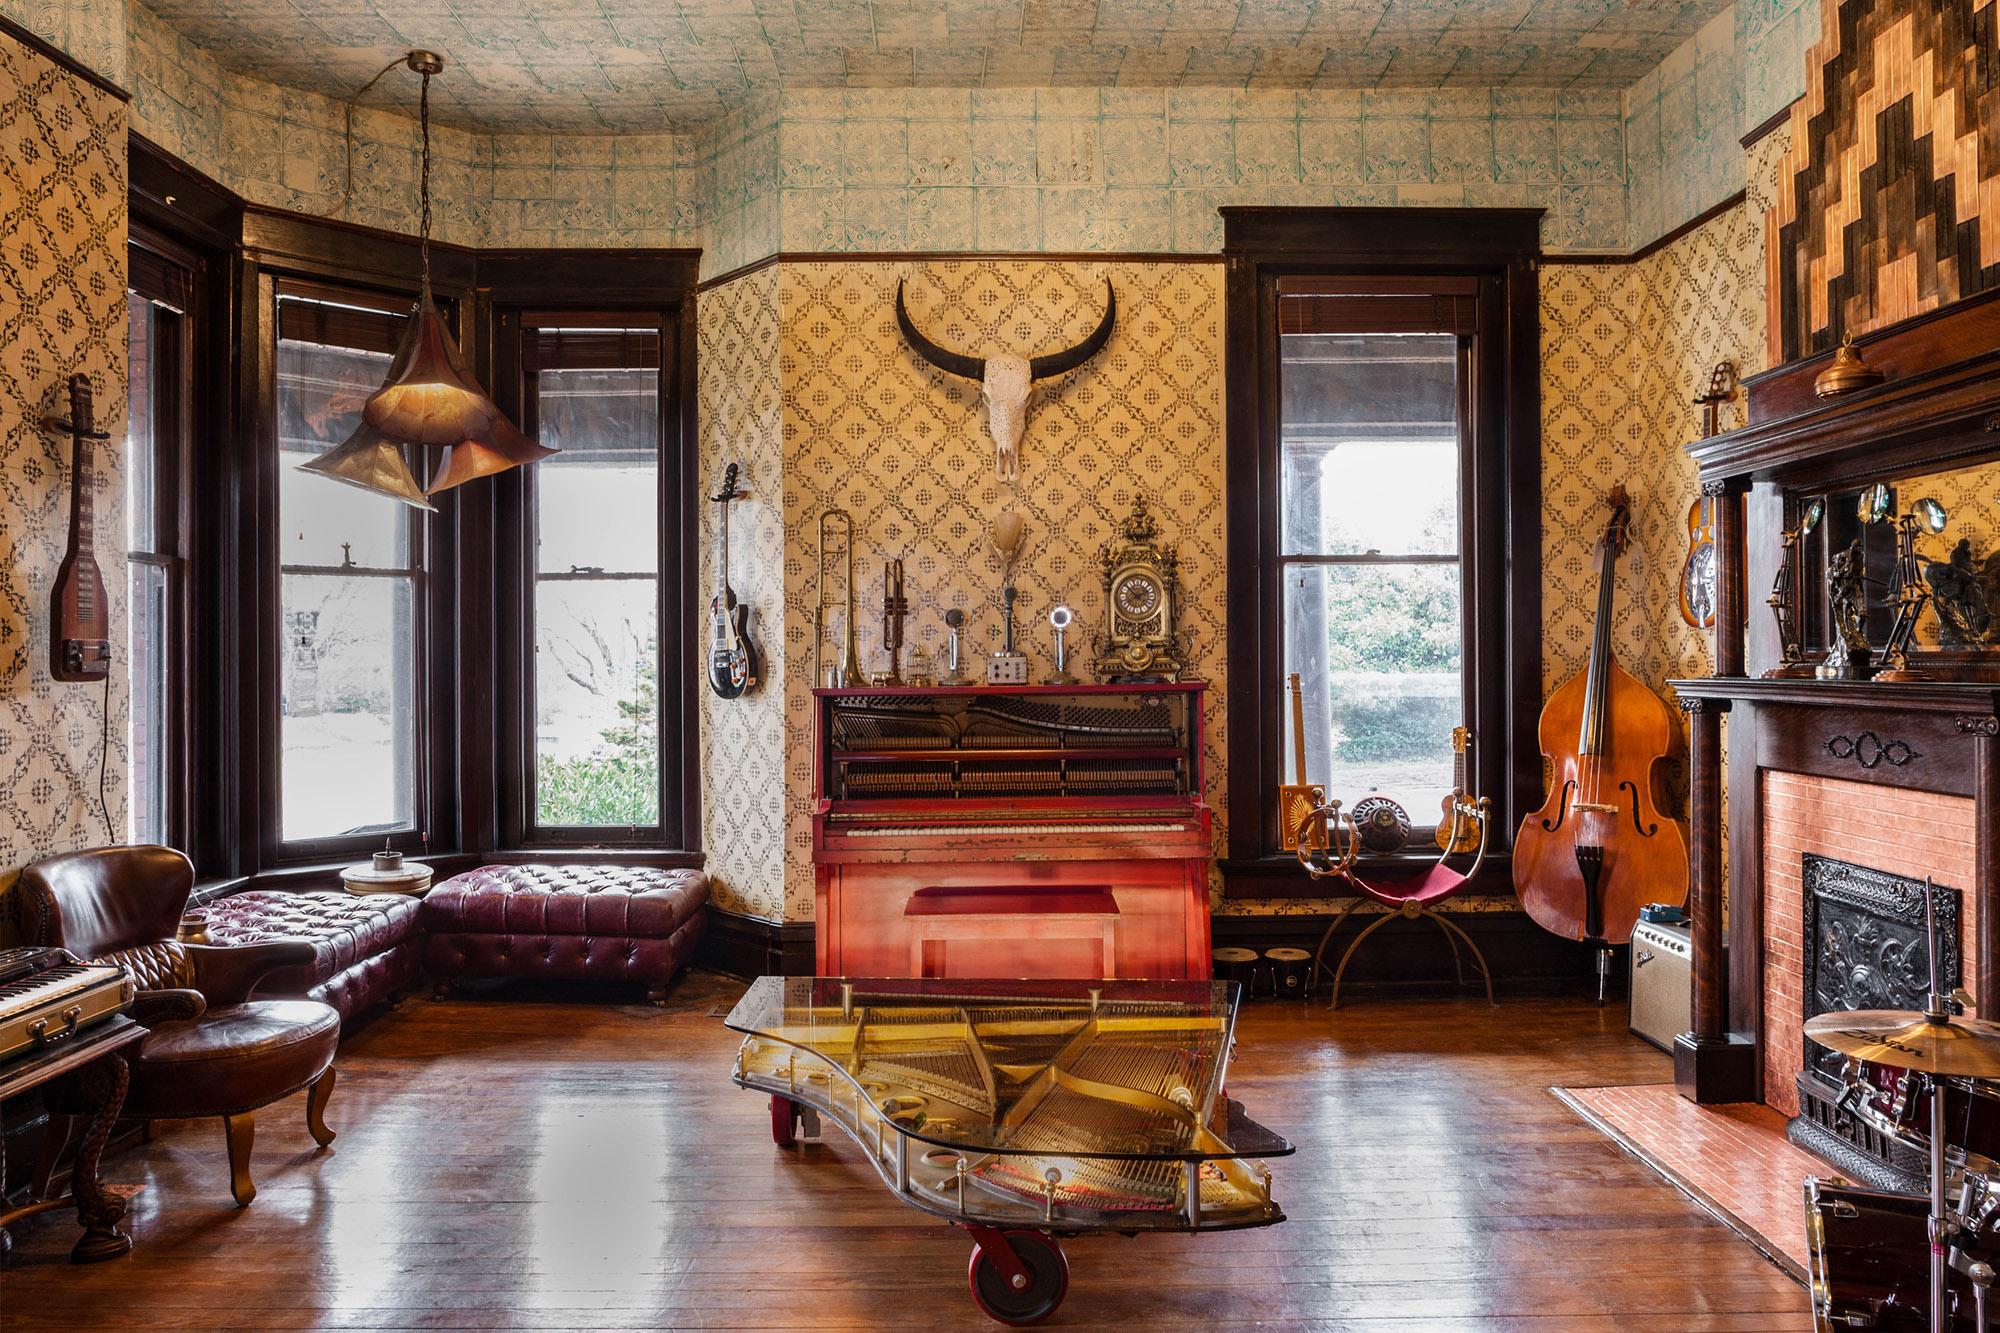 Destination: The Essential Nashville Design Guide